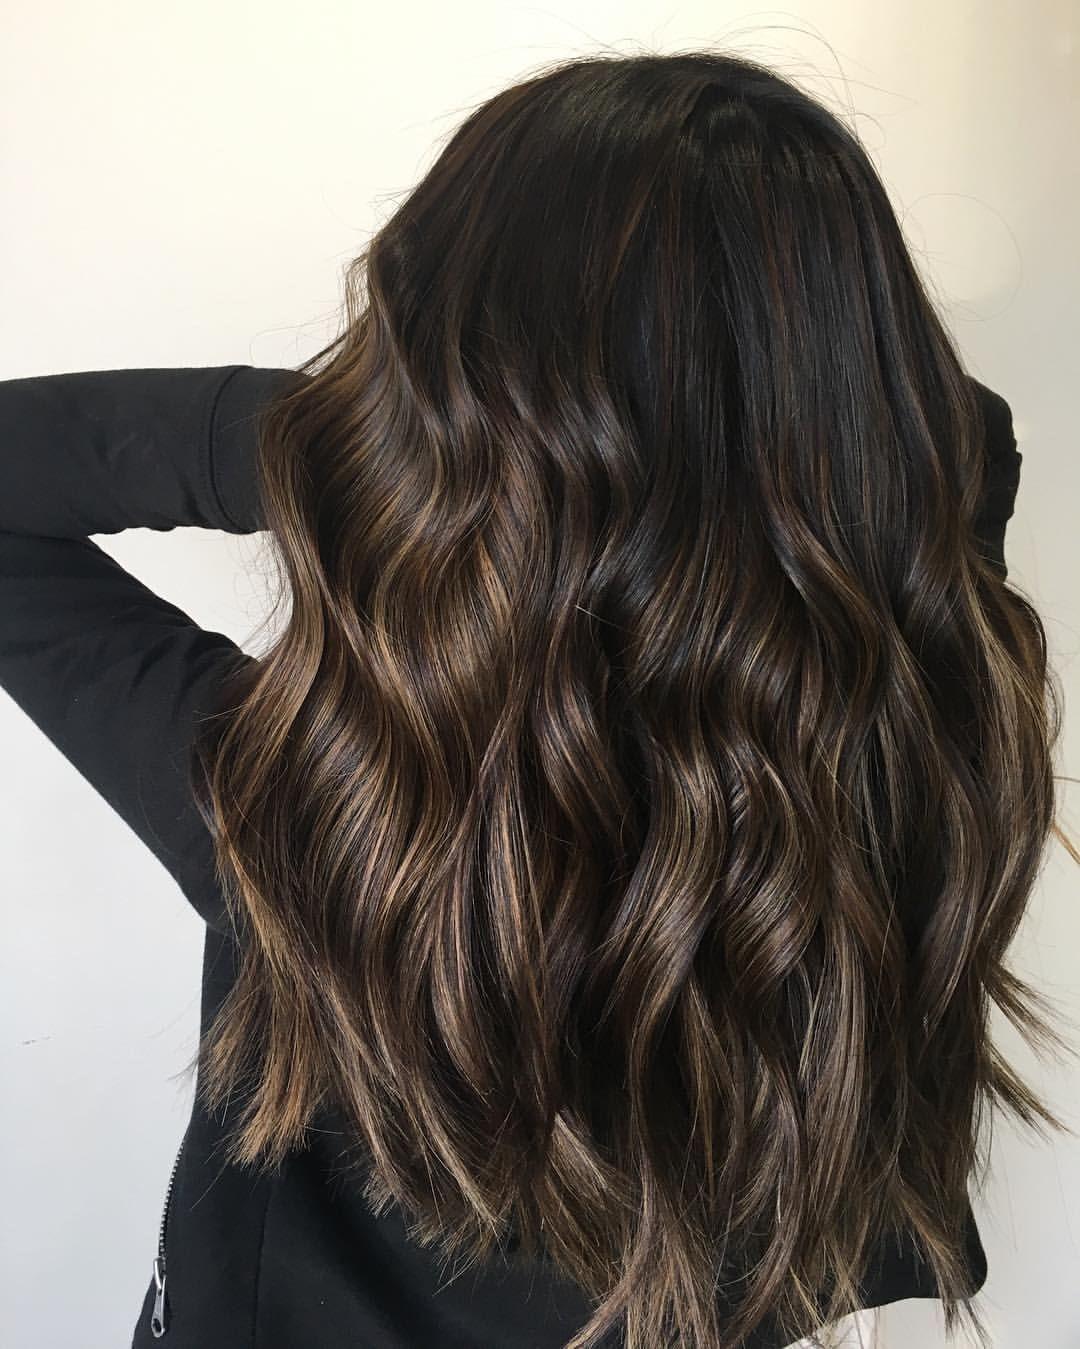 Pin By Valeria Colorado Palmeros On Hair Pinterest Hair